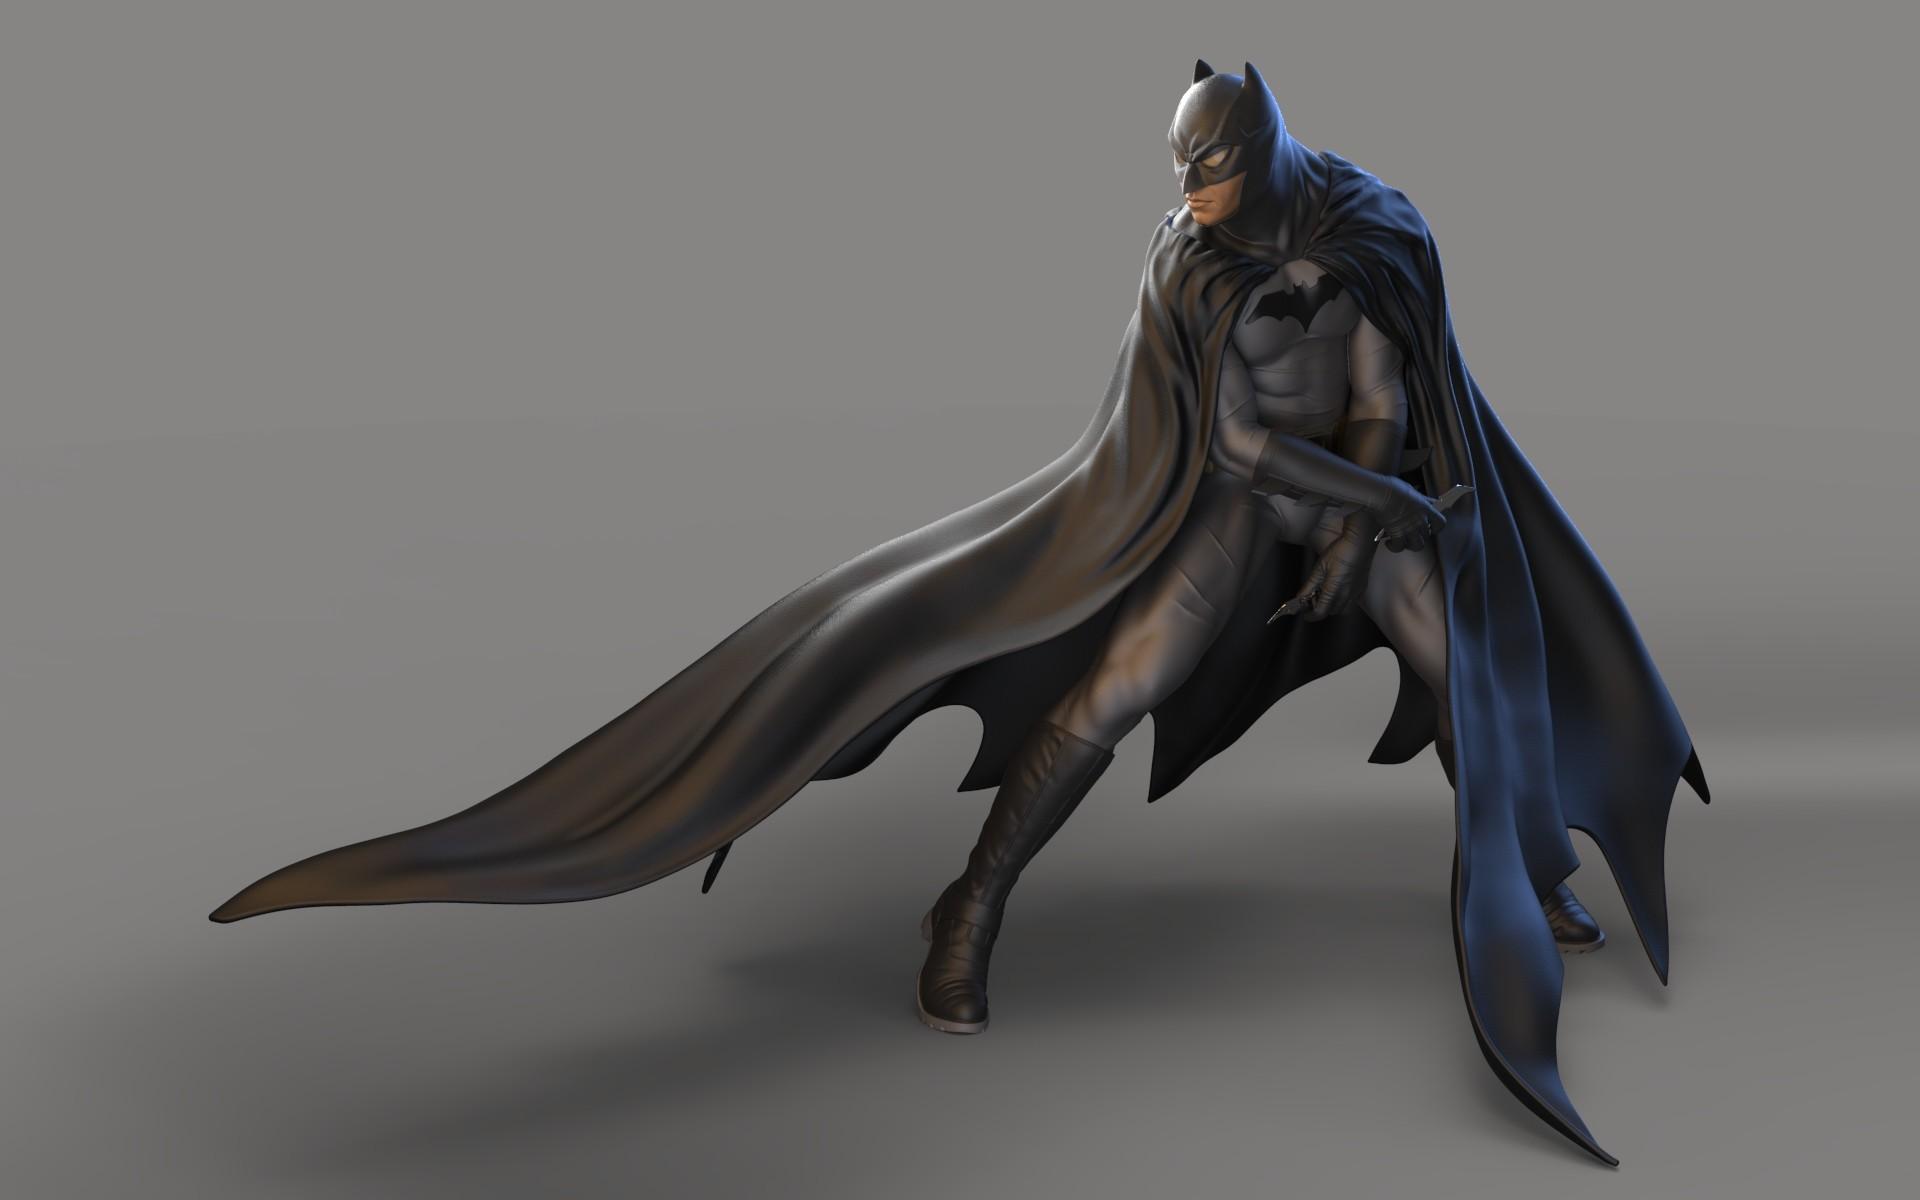 Leon teoh bat keyshot 12